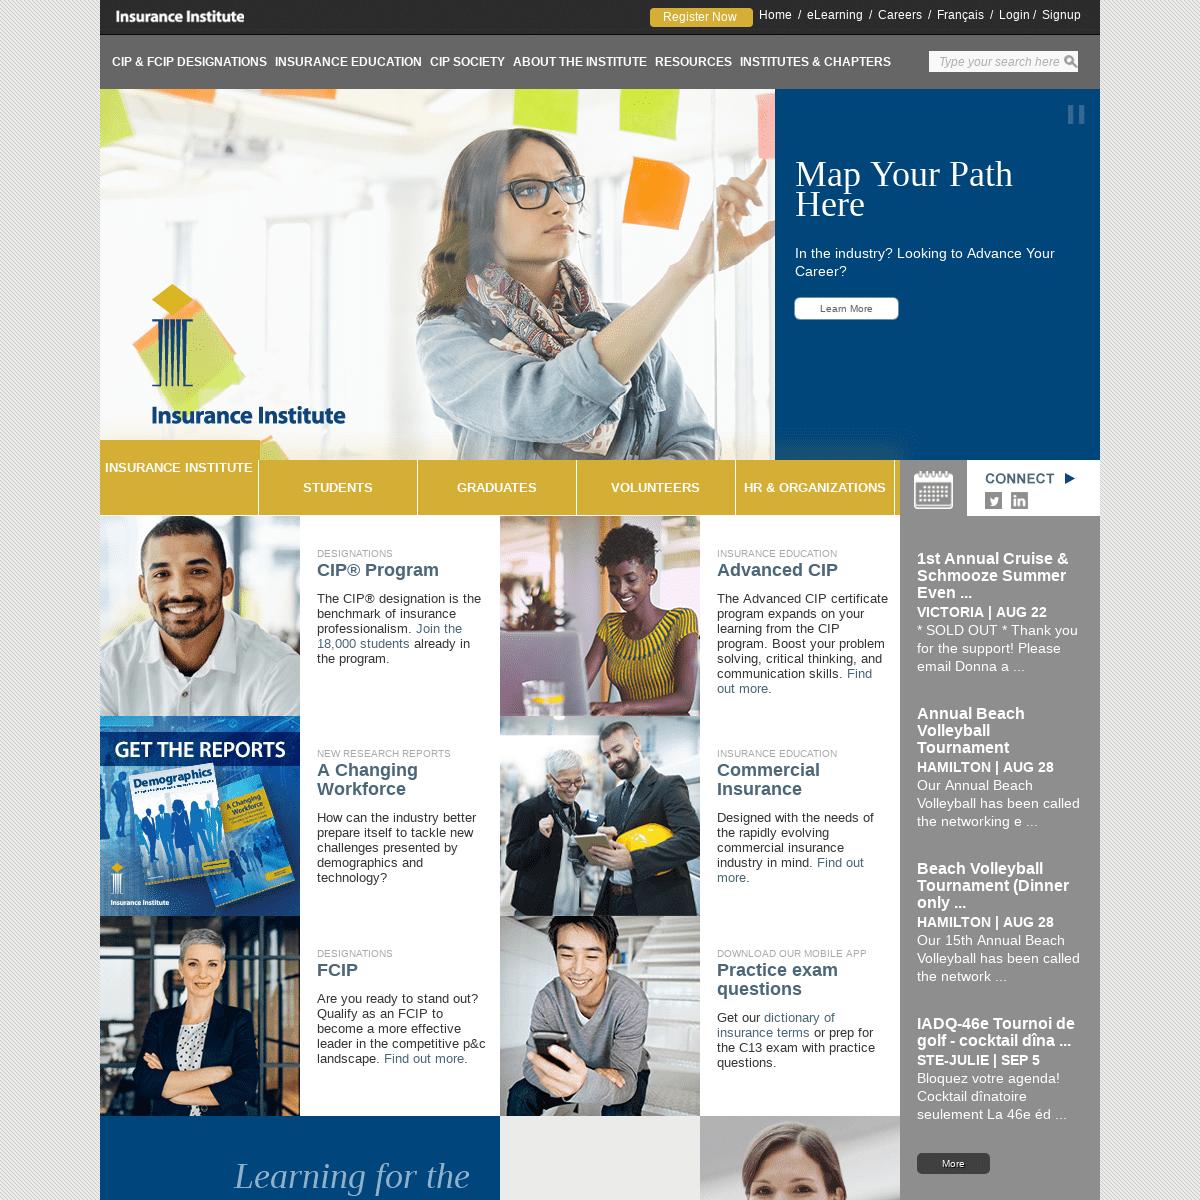 IIC - Insurance Institute of Canada